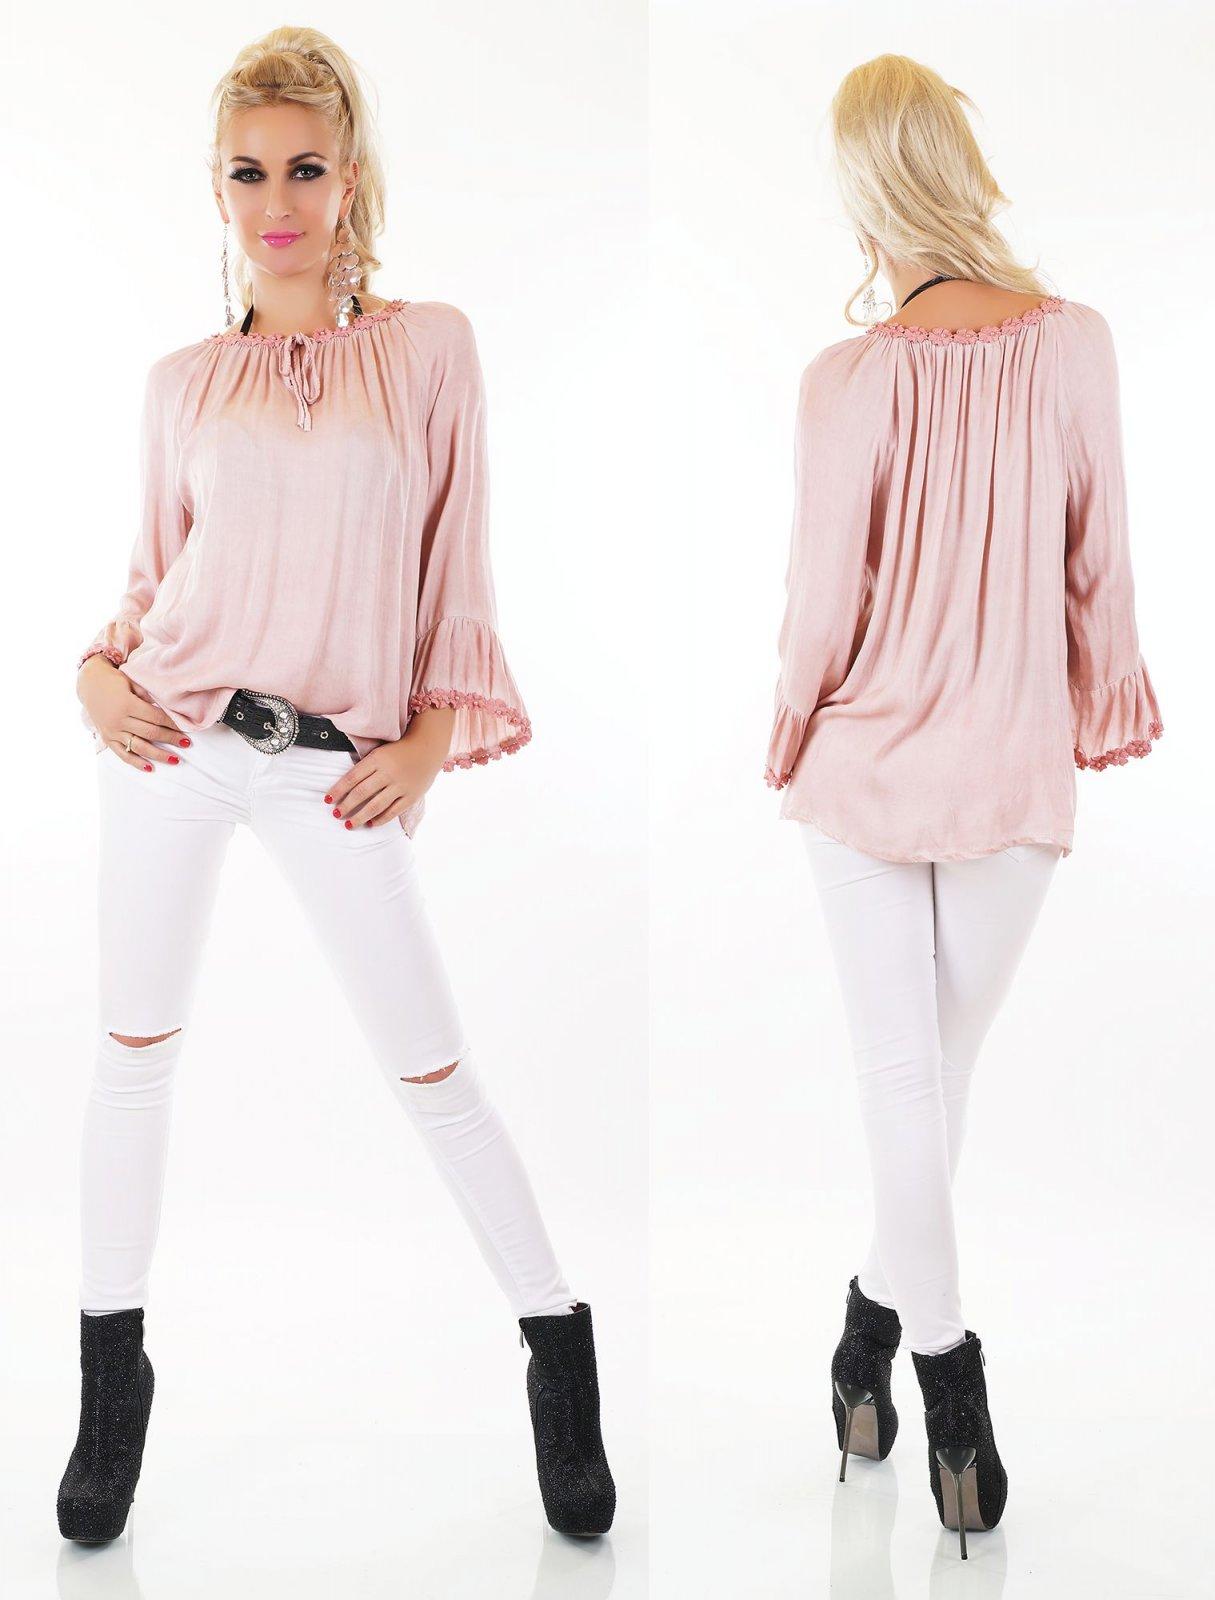 14192437aa7f5 Details zu Italy Damen Bluse Shirt Tunika Carmen Trompetenärmel Perlen Top  36 38 40 42